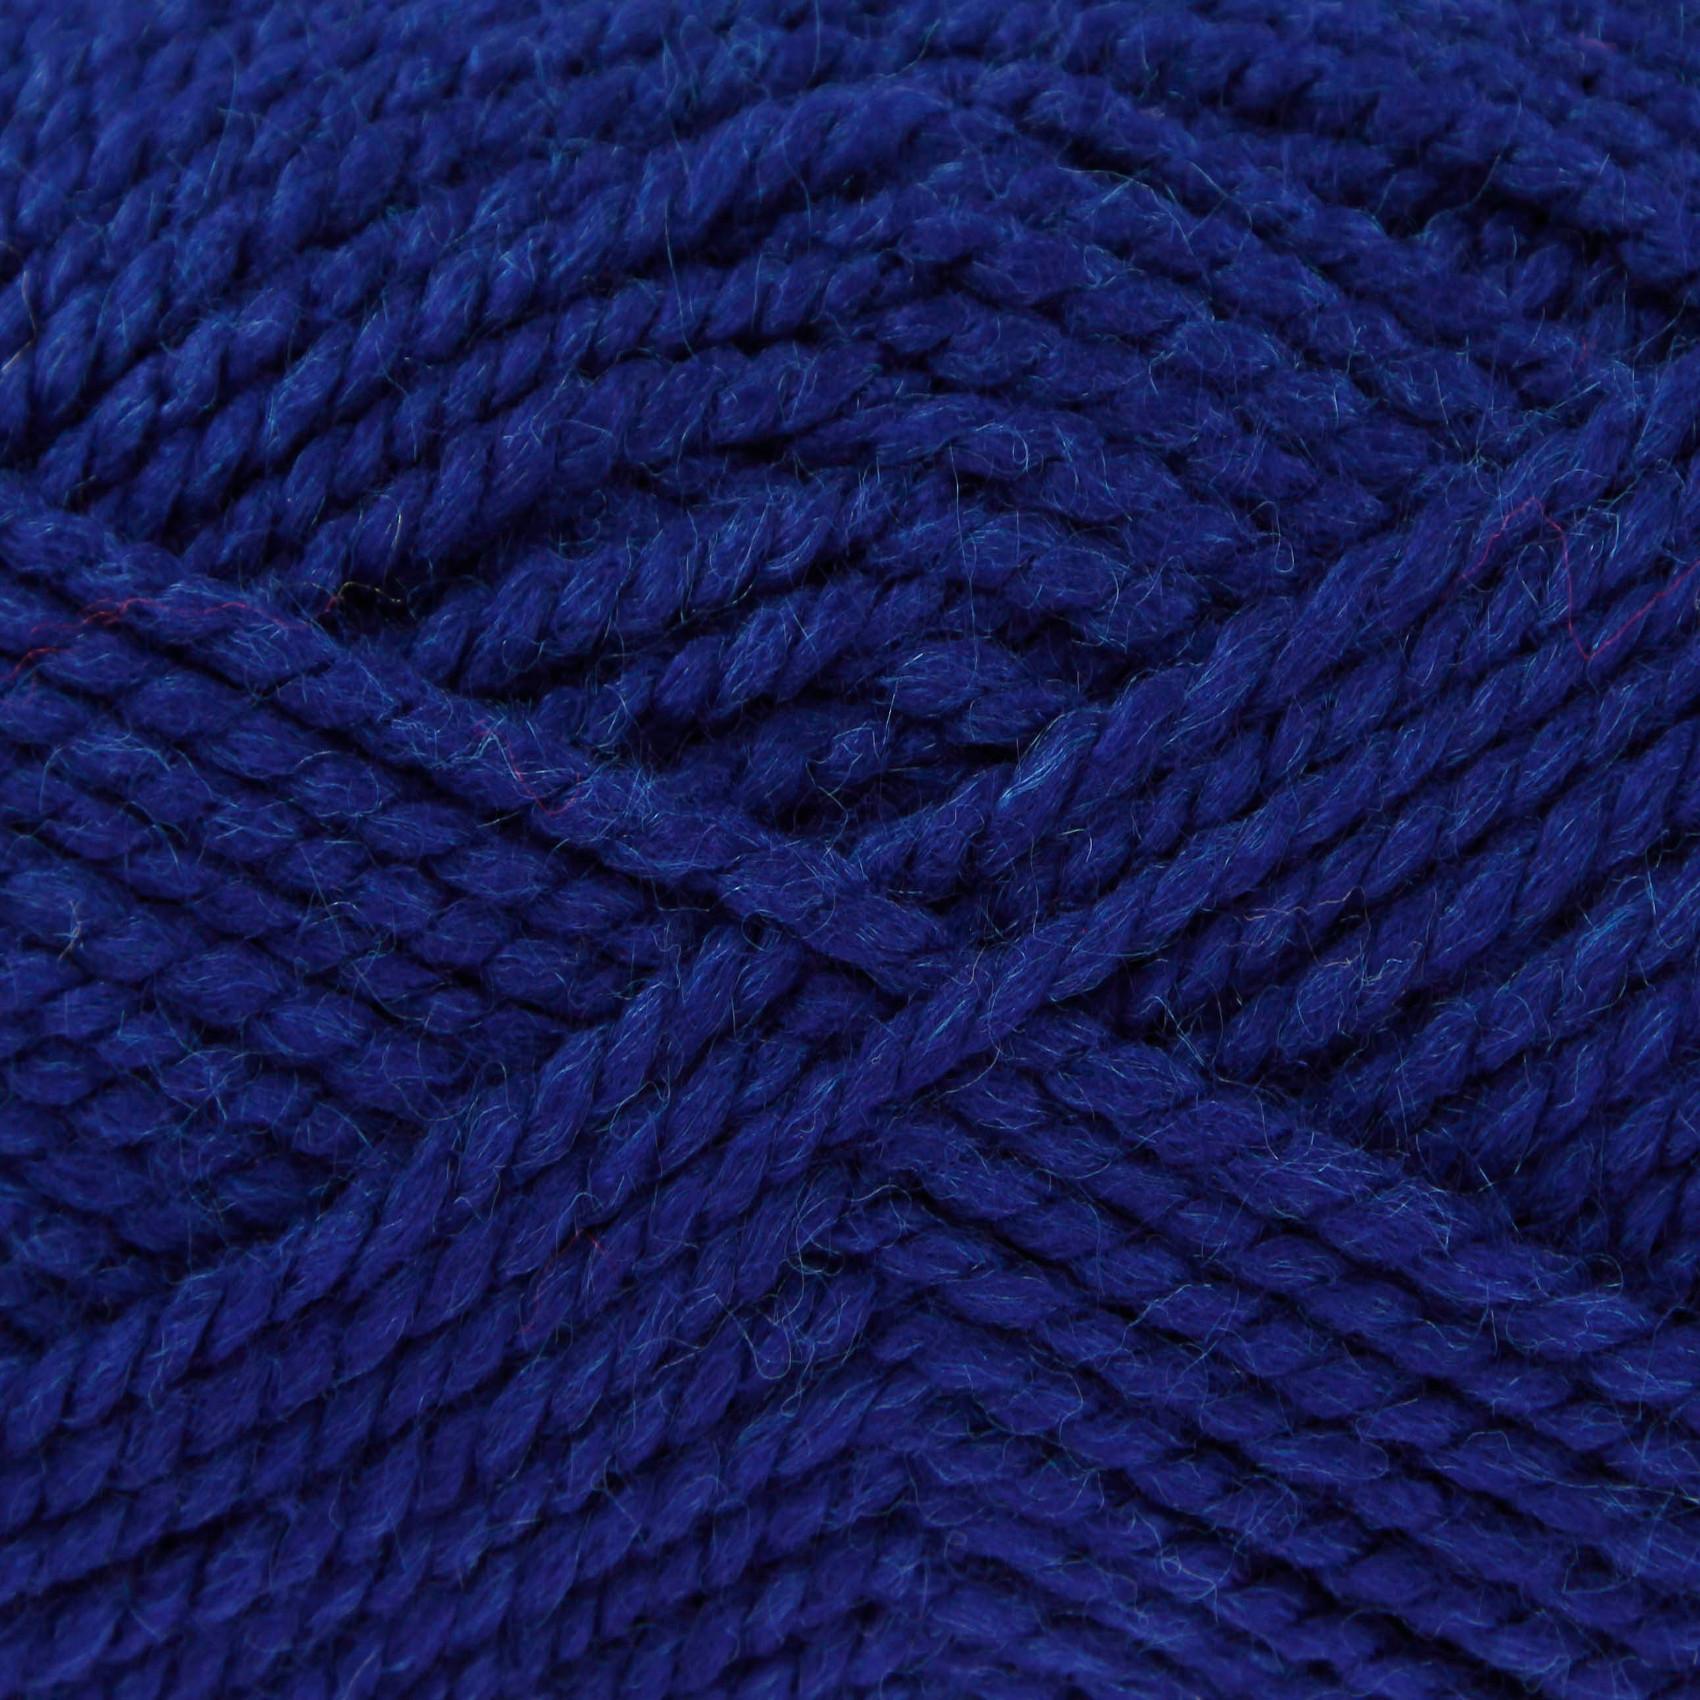 Knitting Patterns Big Wool : Chunky 100g Ball Acrylic Yarn Big Value Wool King Cole ...